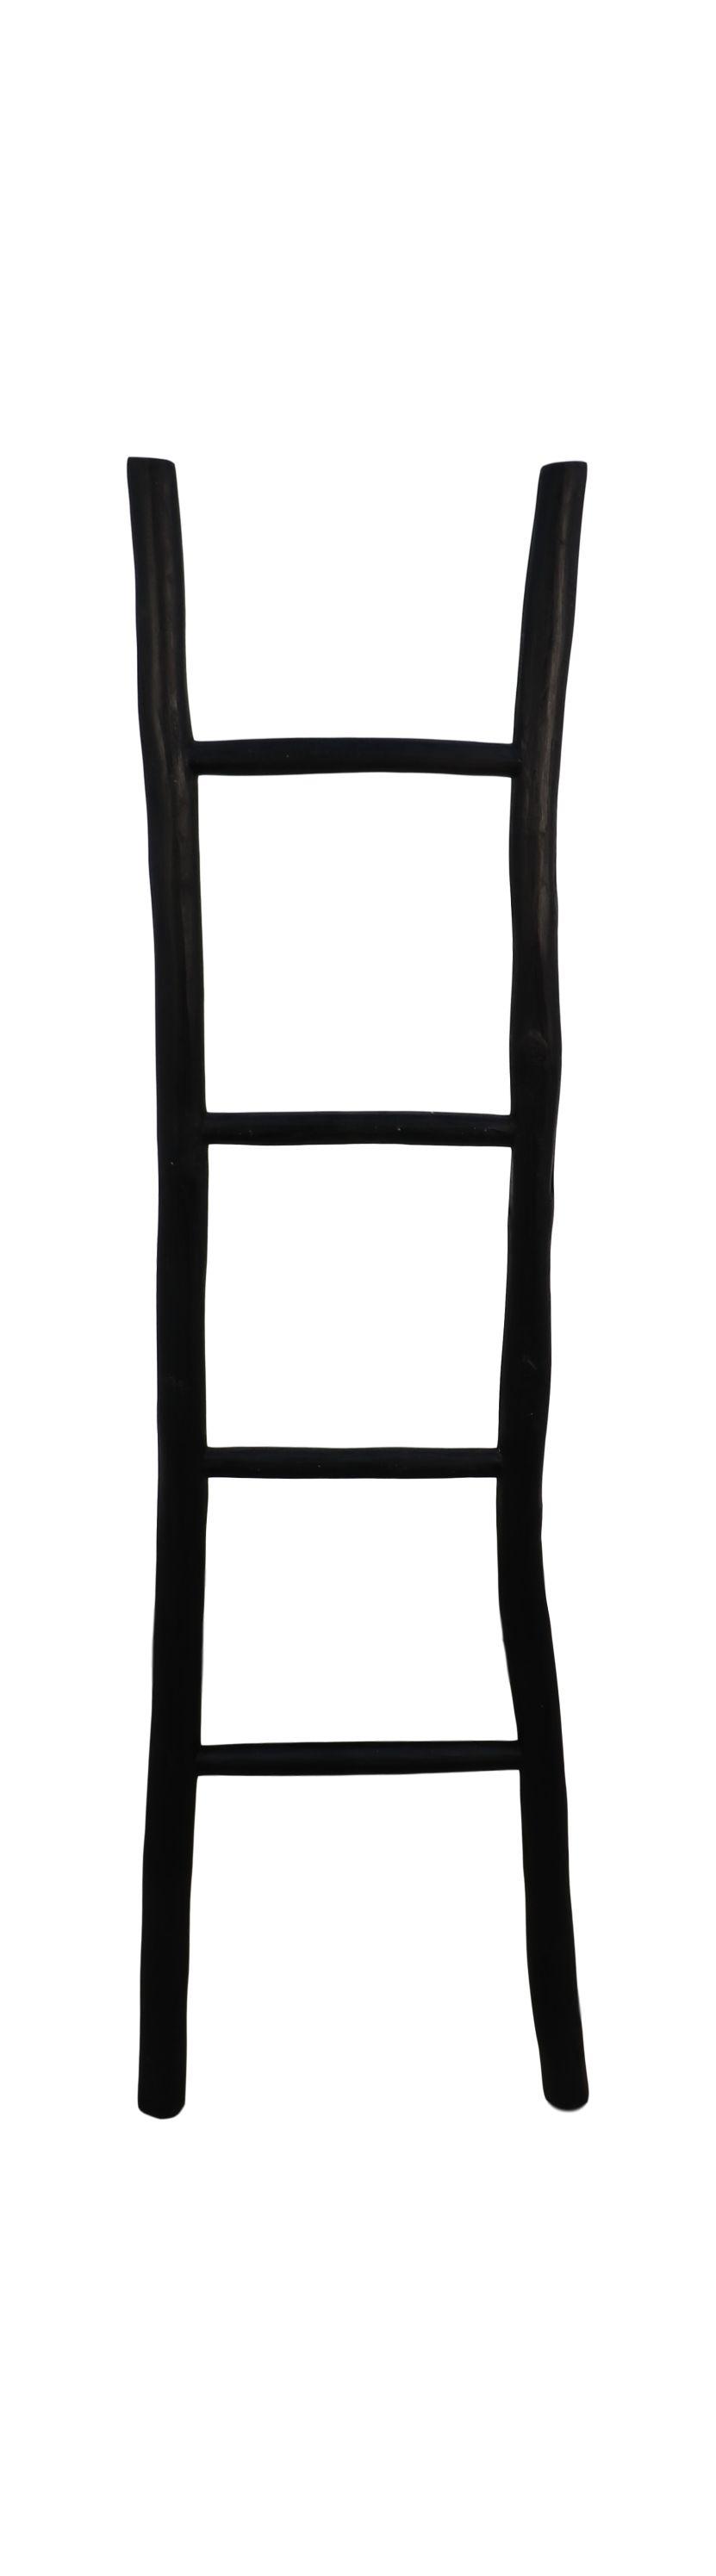 Decorative ladder black